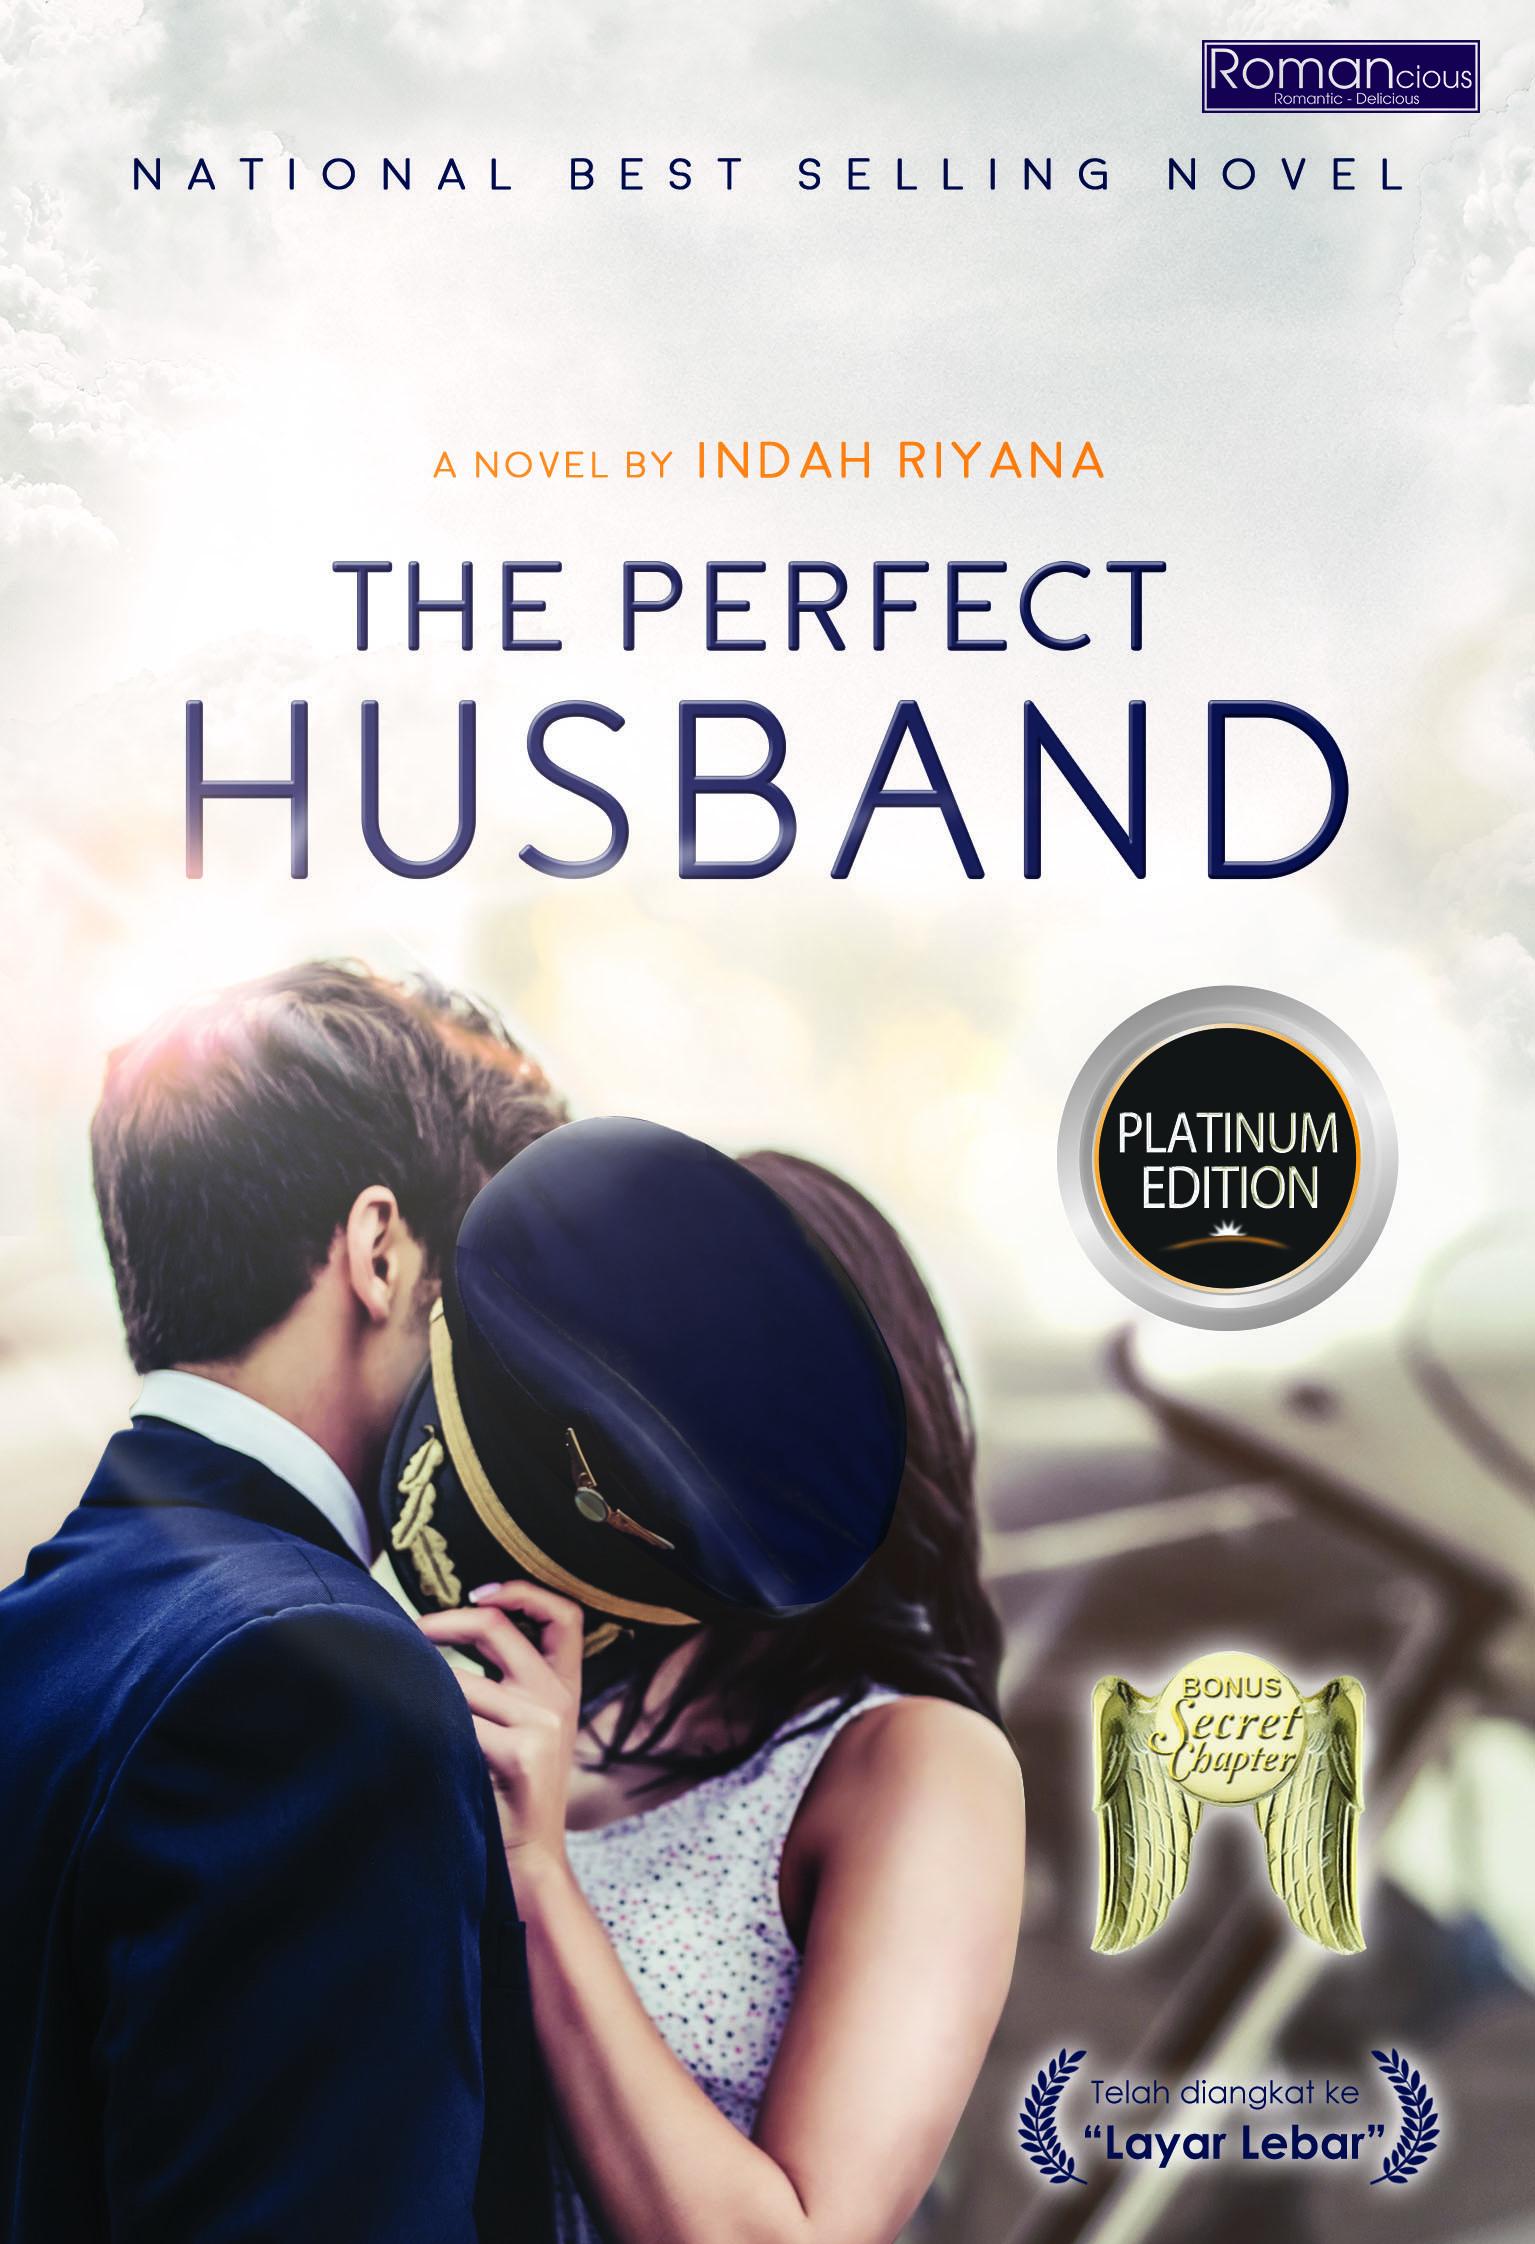 The perfect husband (platinum edition) [sumber elektronis]